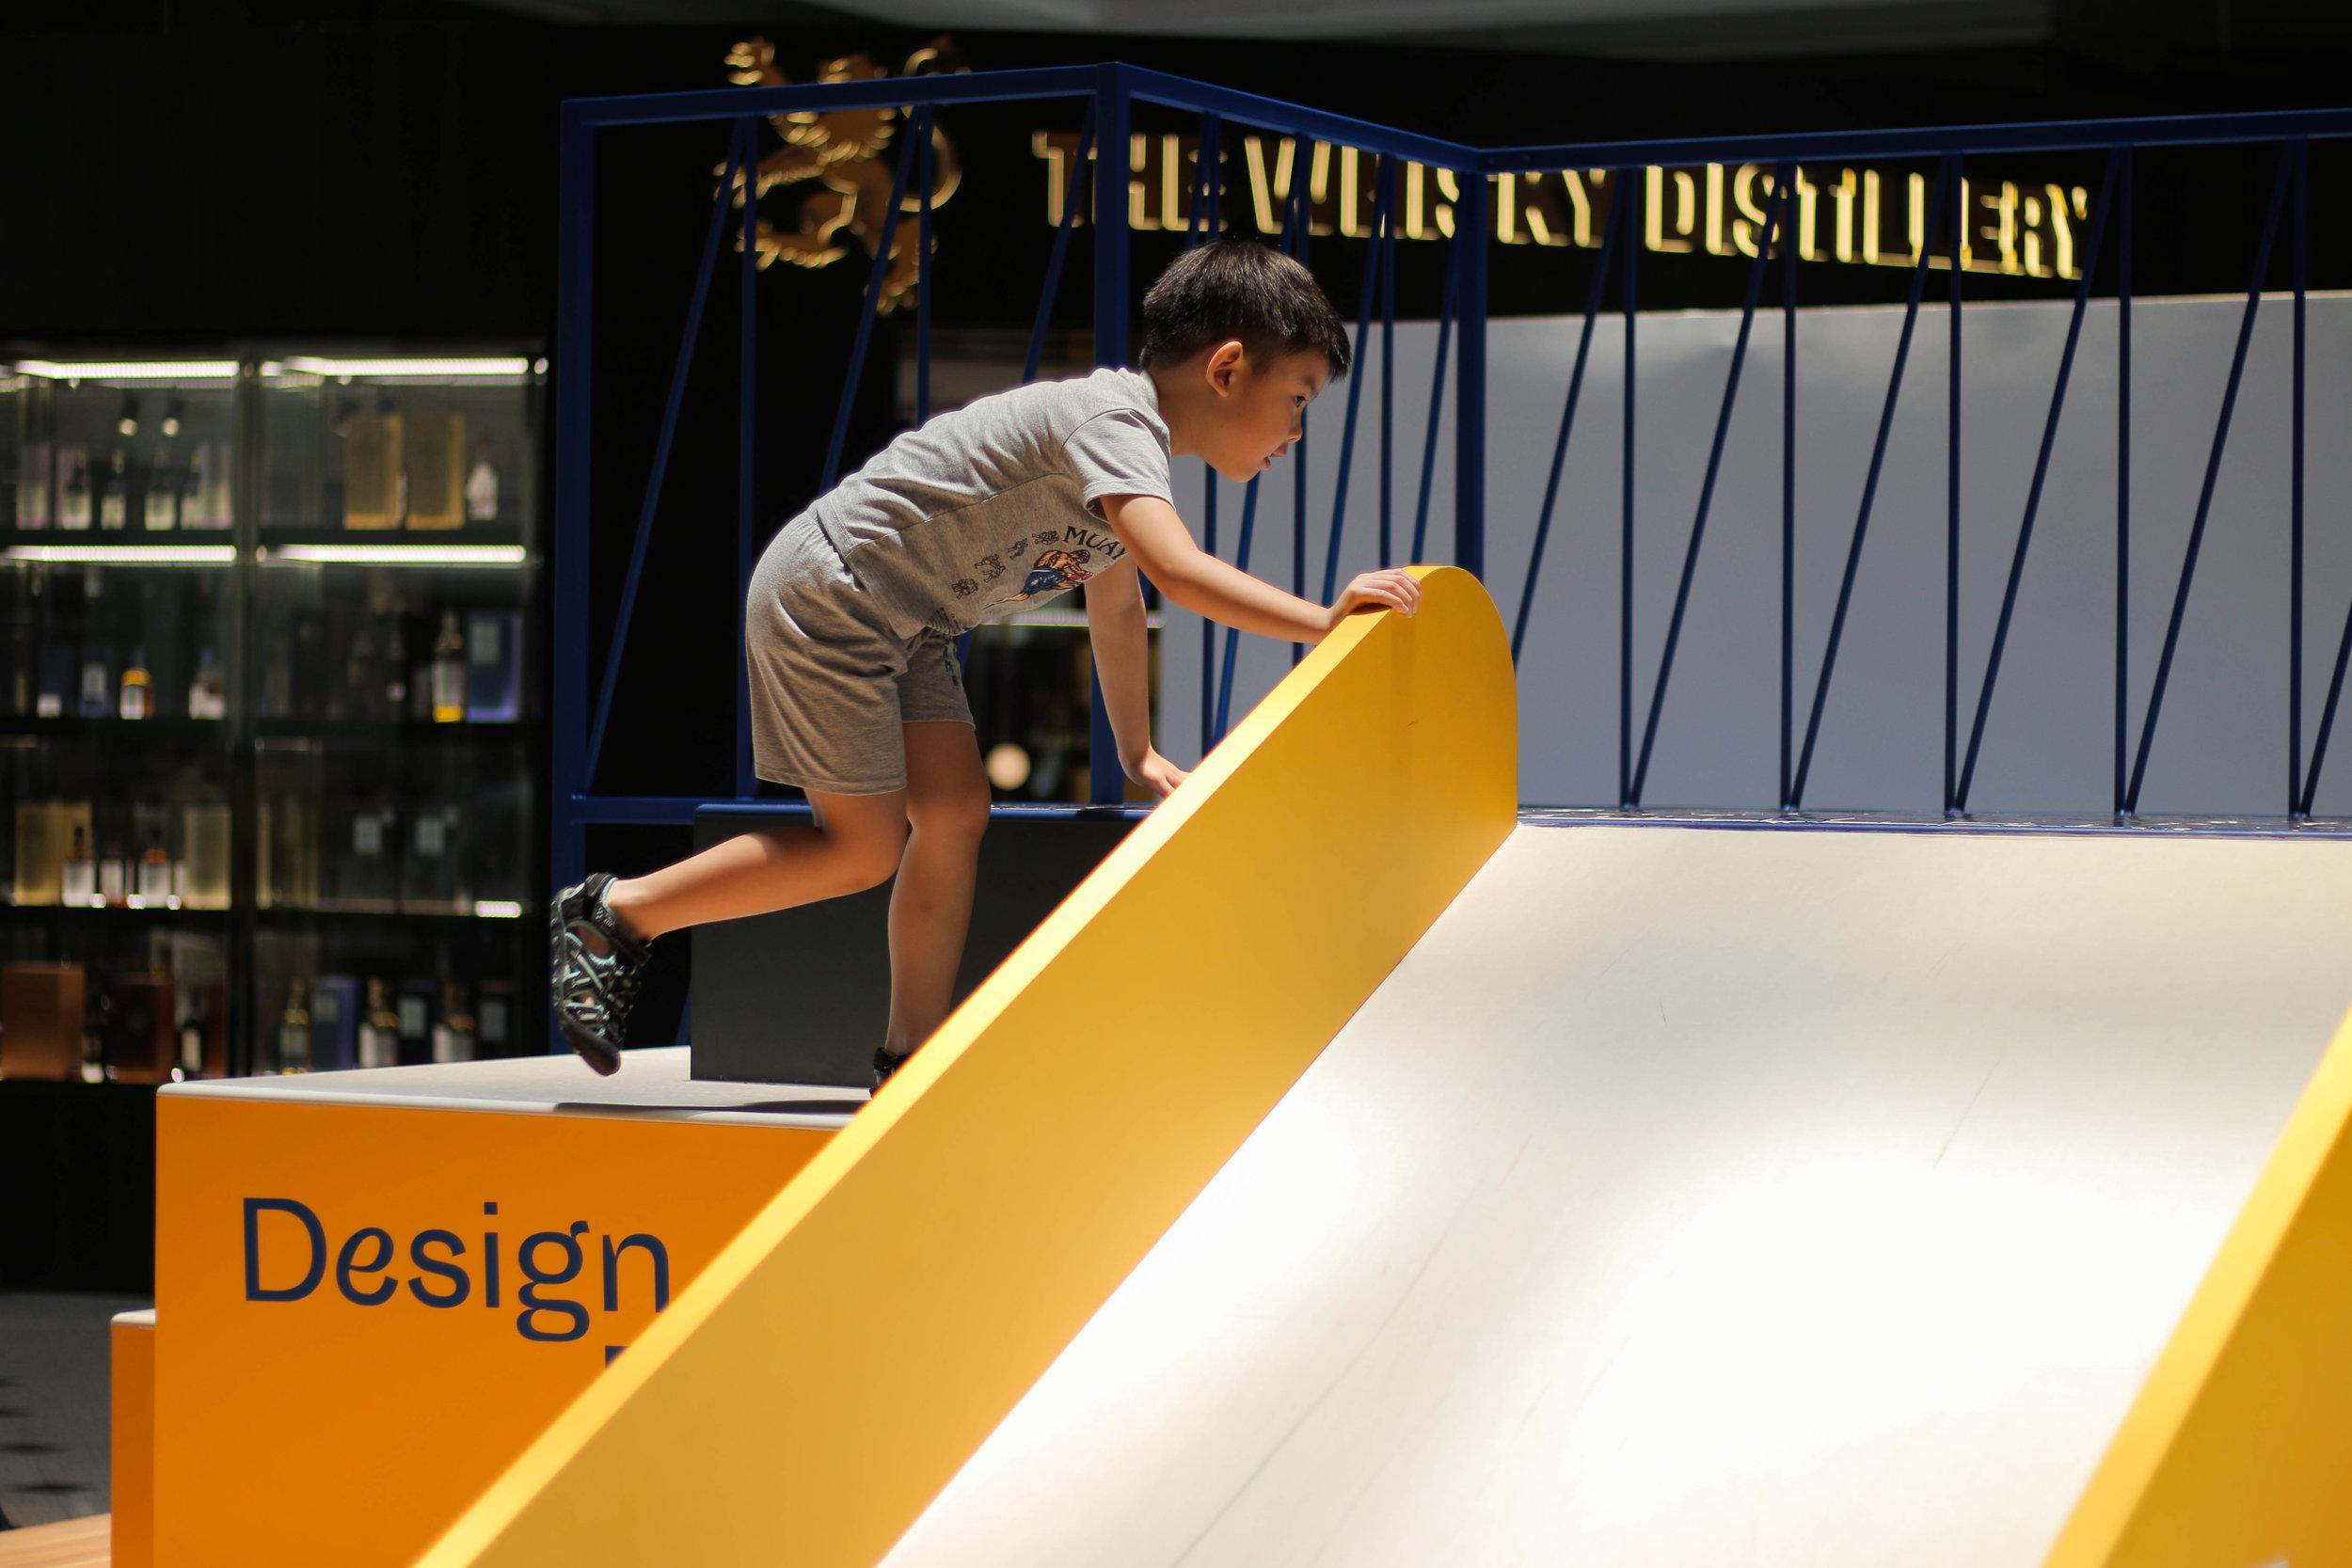 outeredit - millenia walk design play space - climb